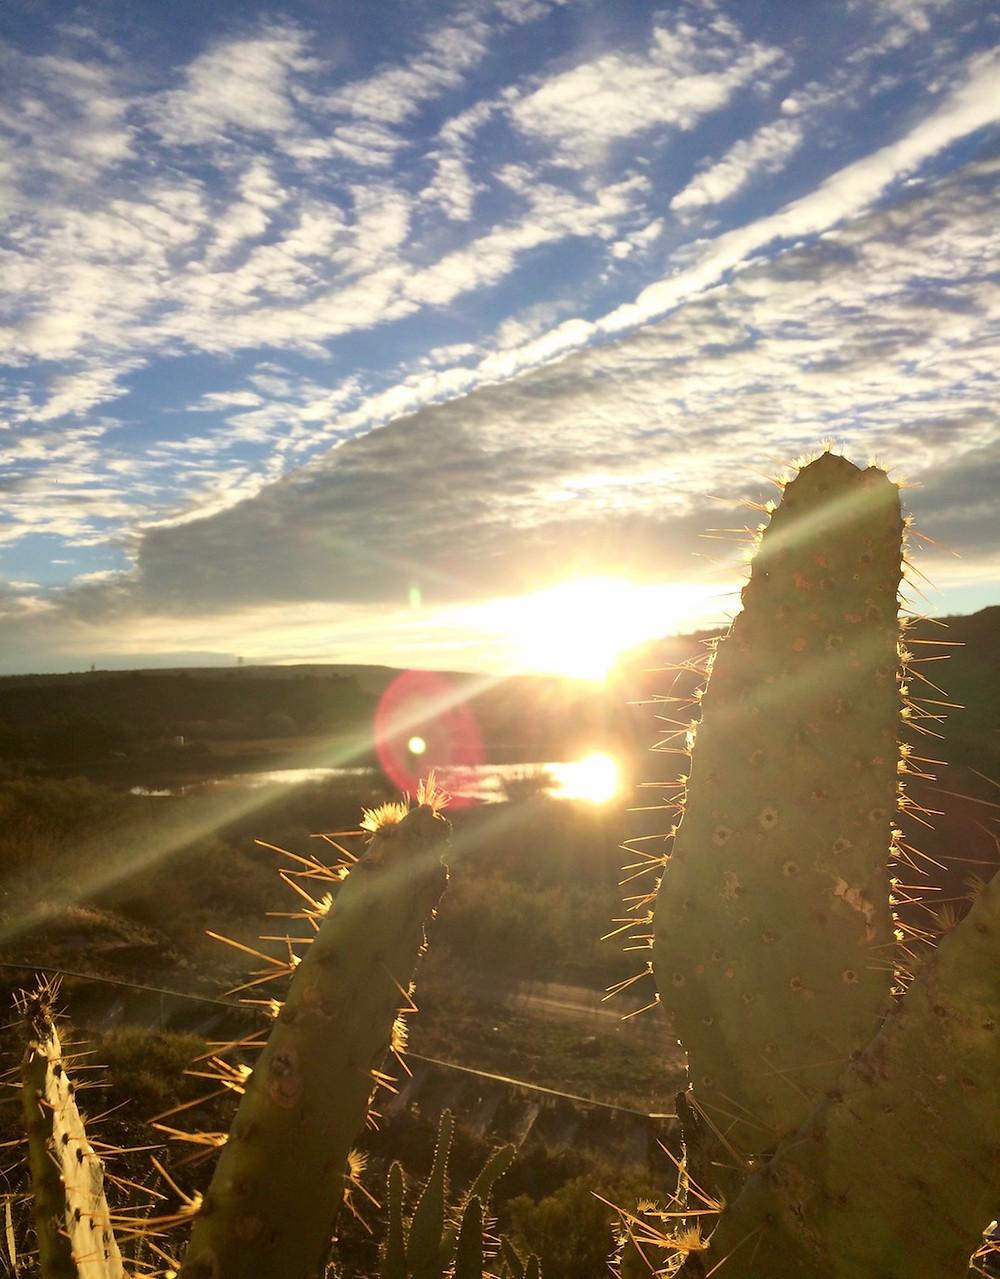 Programs cactus arizona united state aude lechrist freedom liberté lumière